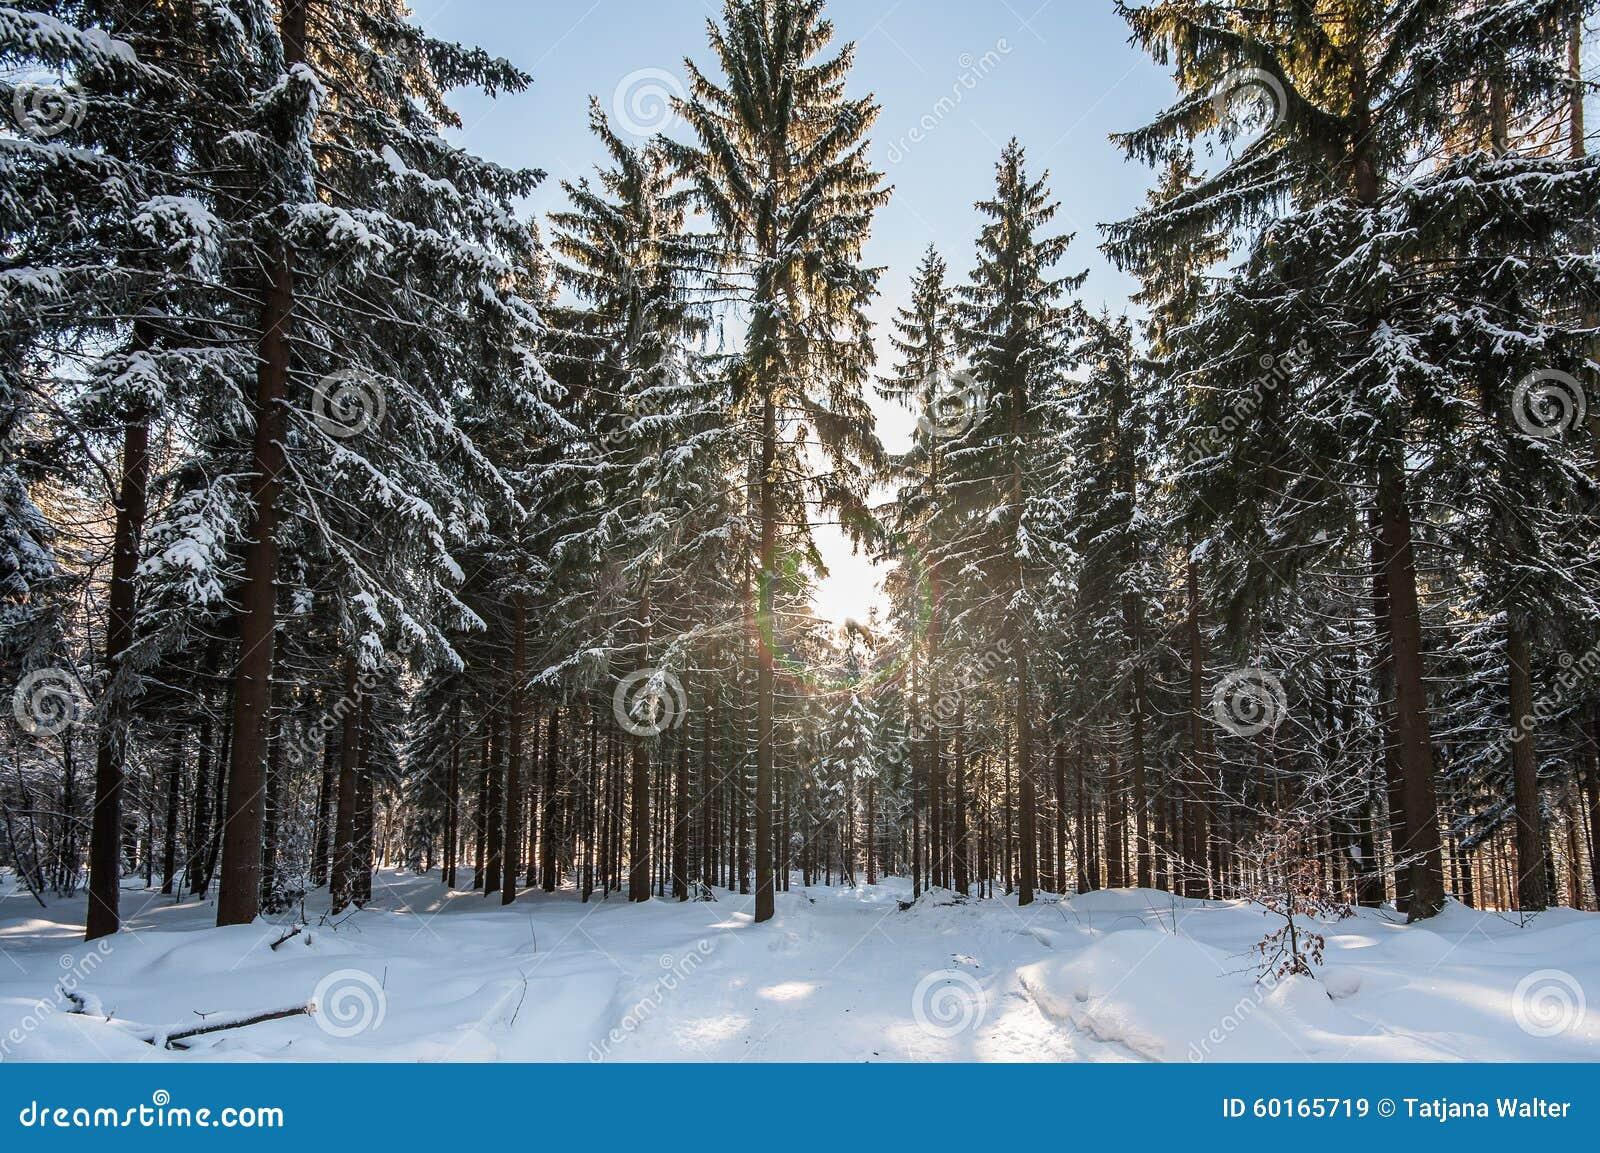 winter-landscape-fresh-clean-snow-sun-christmas-trees-snowy-sunny-fir-tree-foreground-tree-stump-blue-sky-60165719 Fresh Christmas Trees Prices